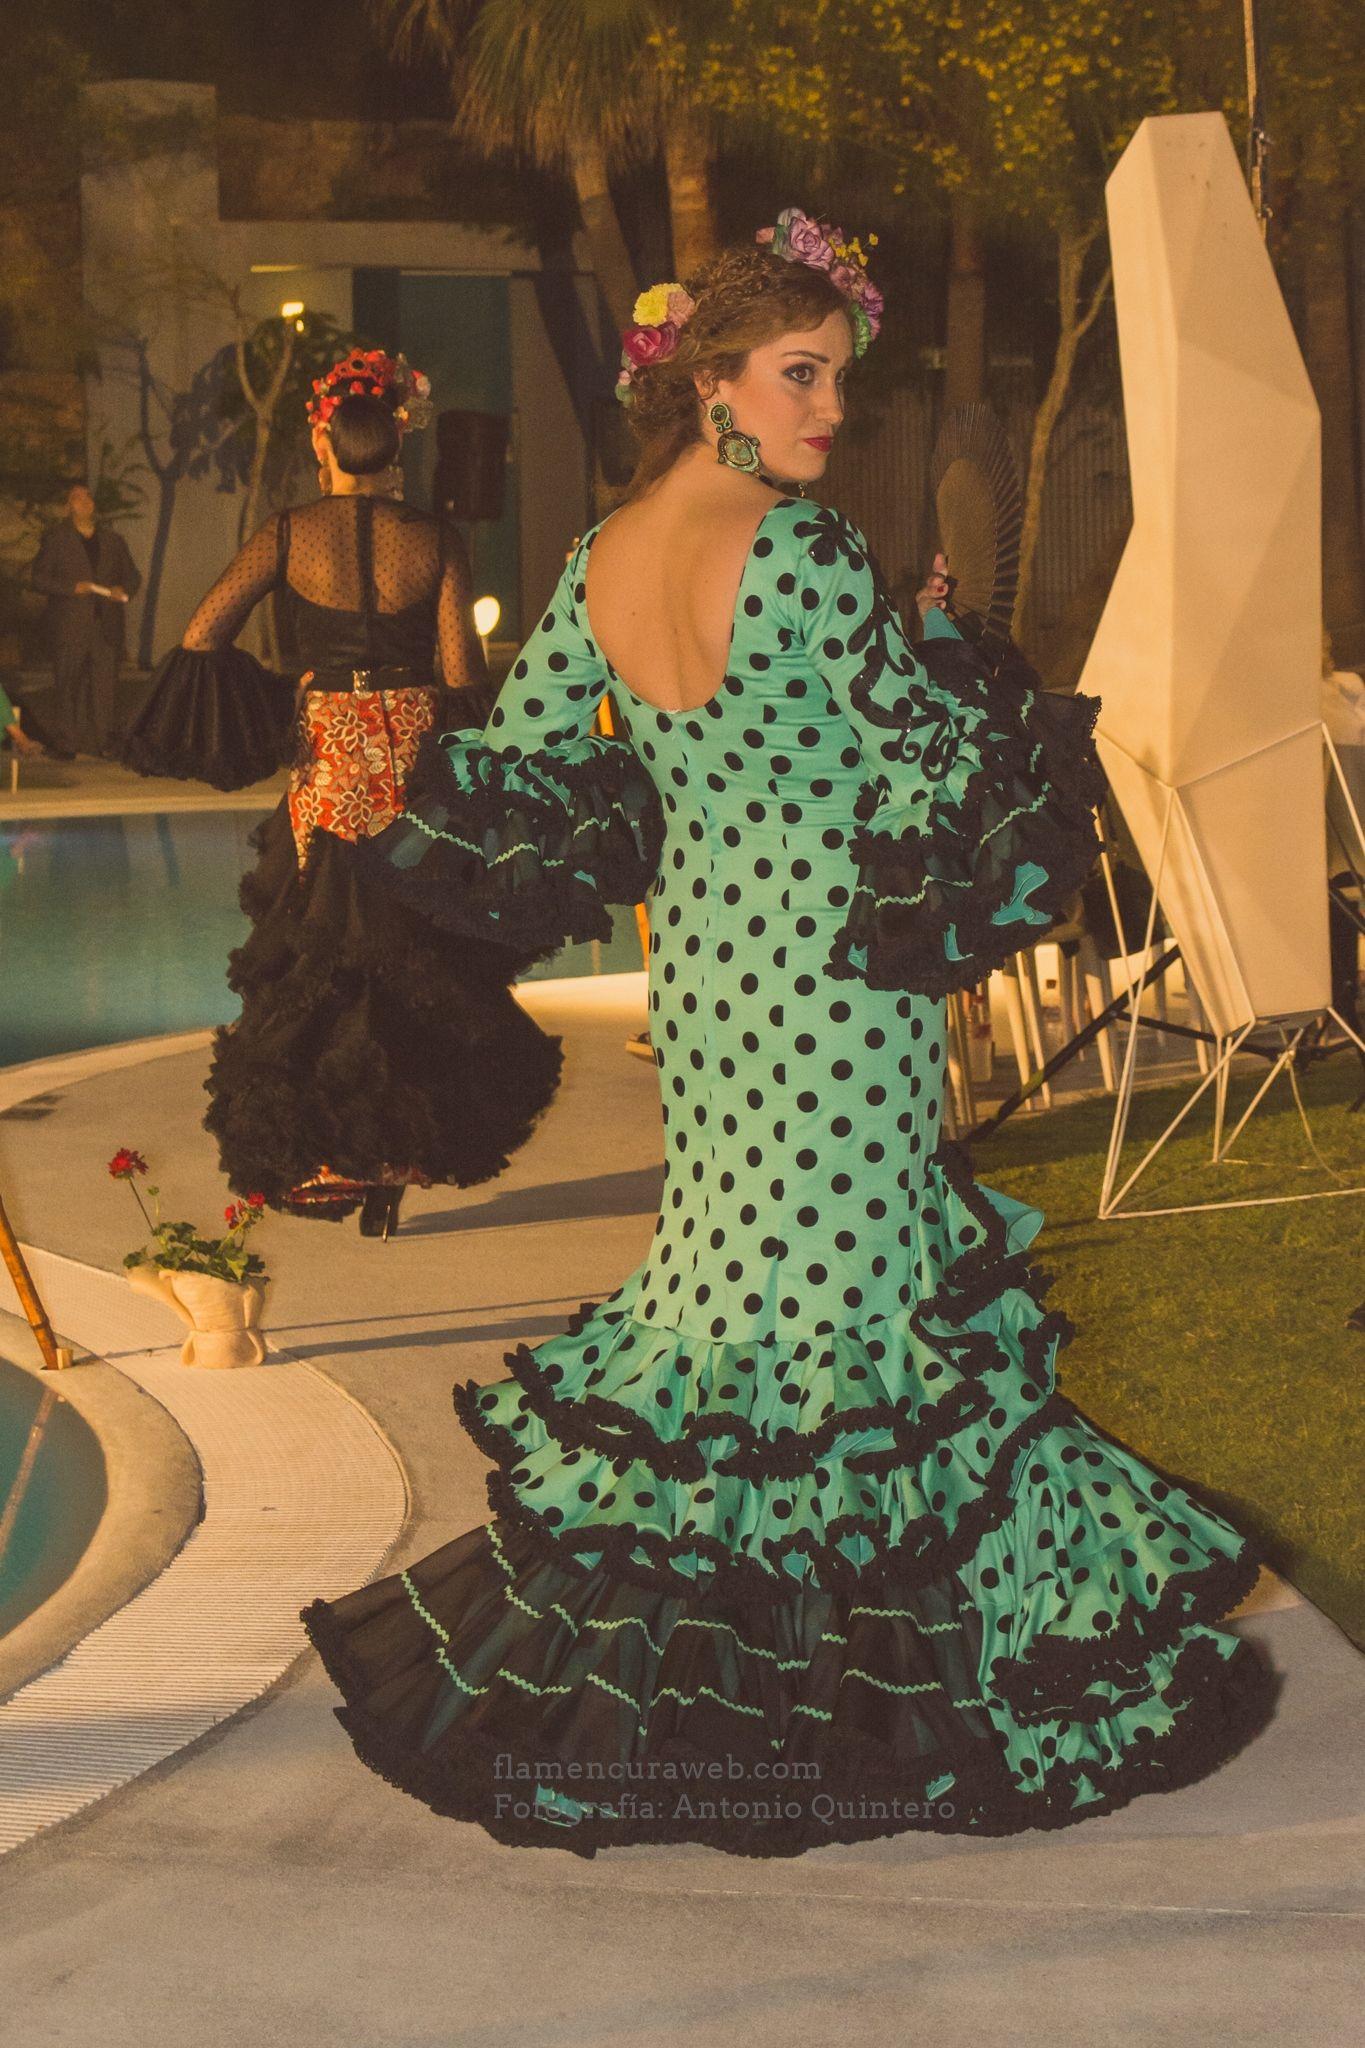 flamencuraweb.com   Desfile Pasarela Melisa Lozano Pa Enamora